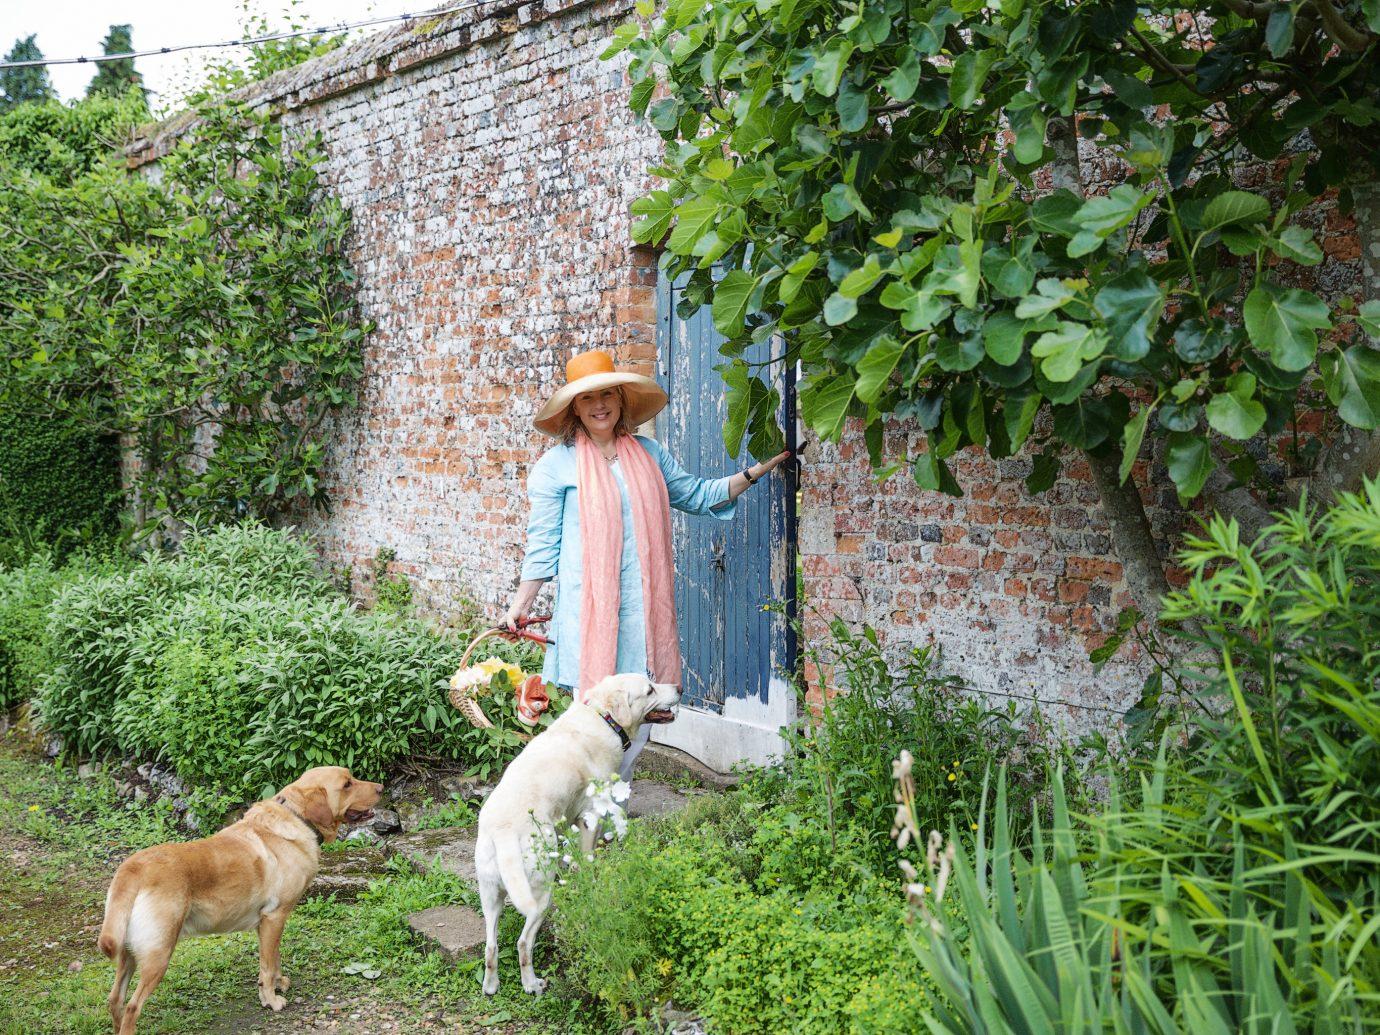 Offbeat tree Dog outdoor agriculture rural area lawn Garden flower yard